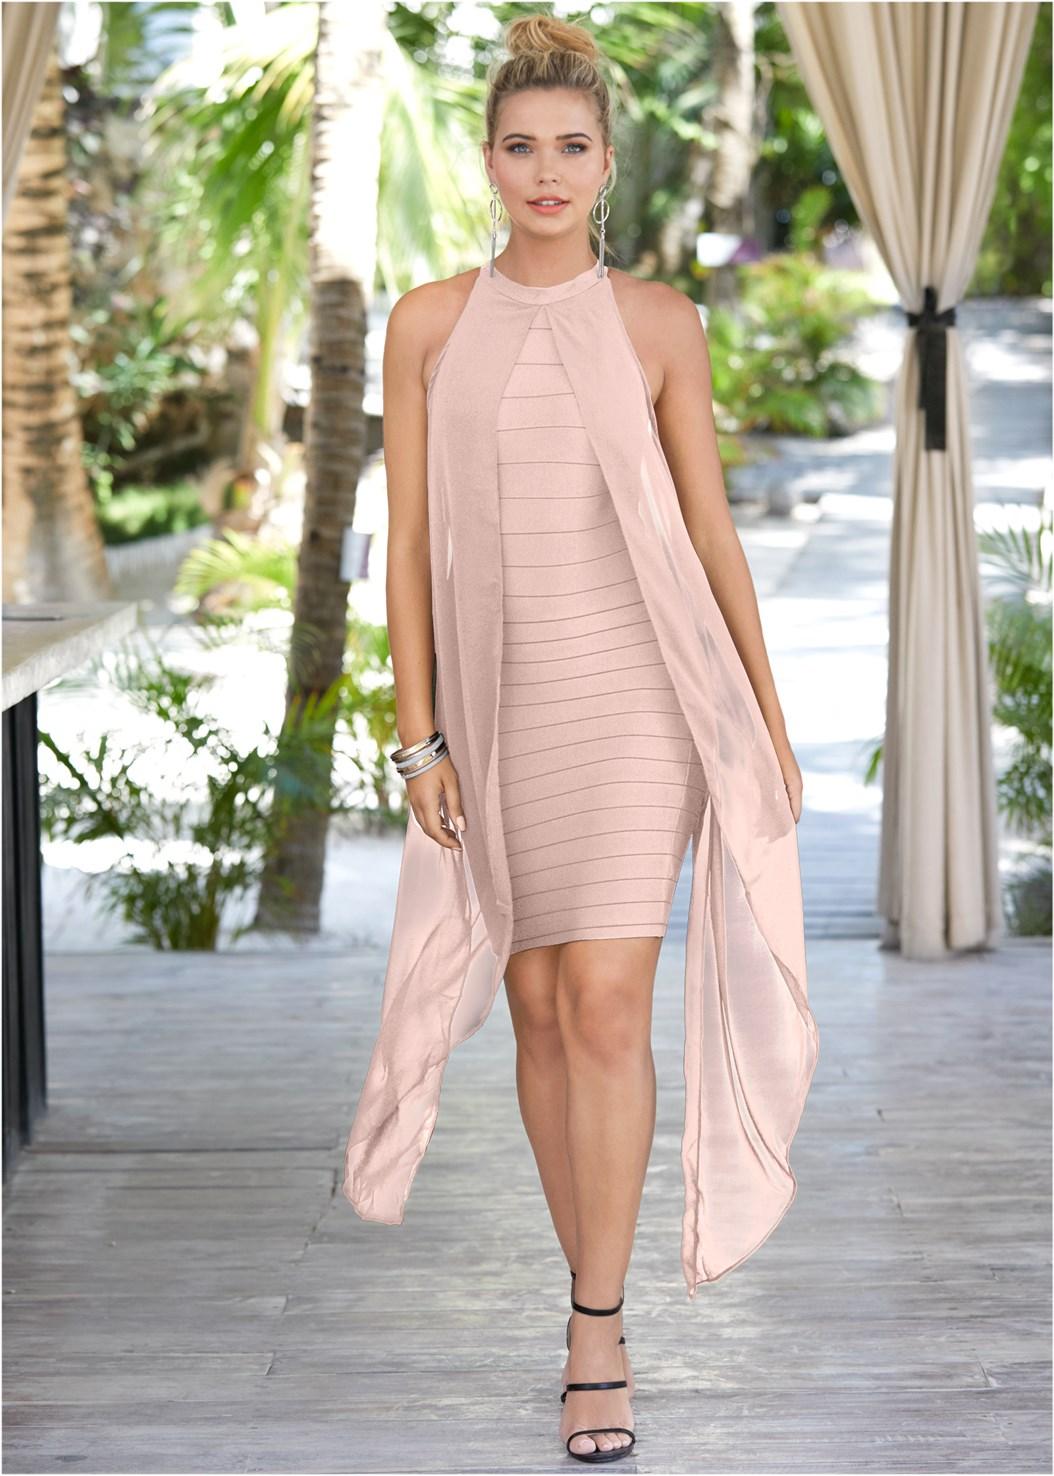 Bandage Dress,Strap Solutions,Full Figure Strapless Bra,High Heel Strappy Sandals